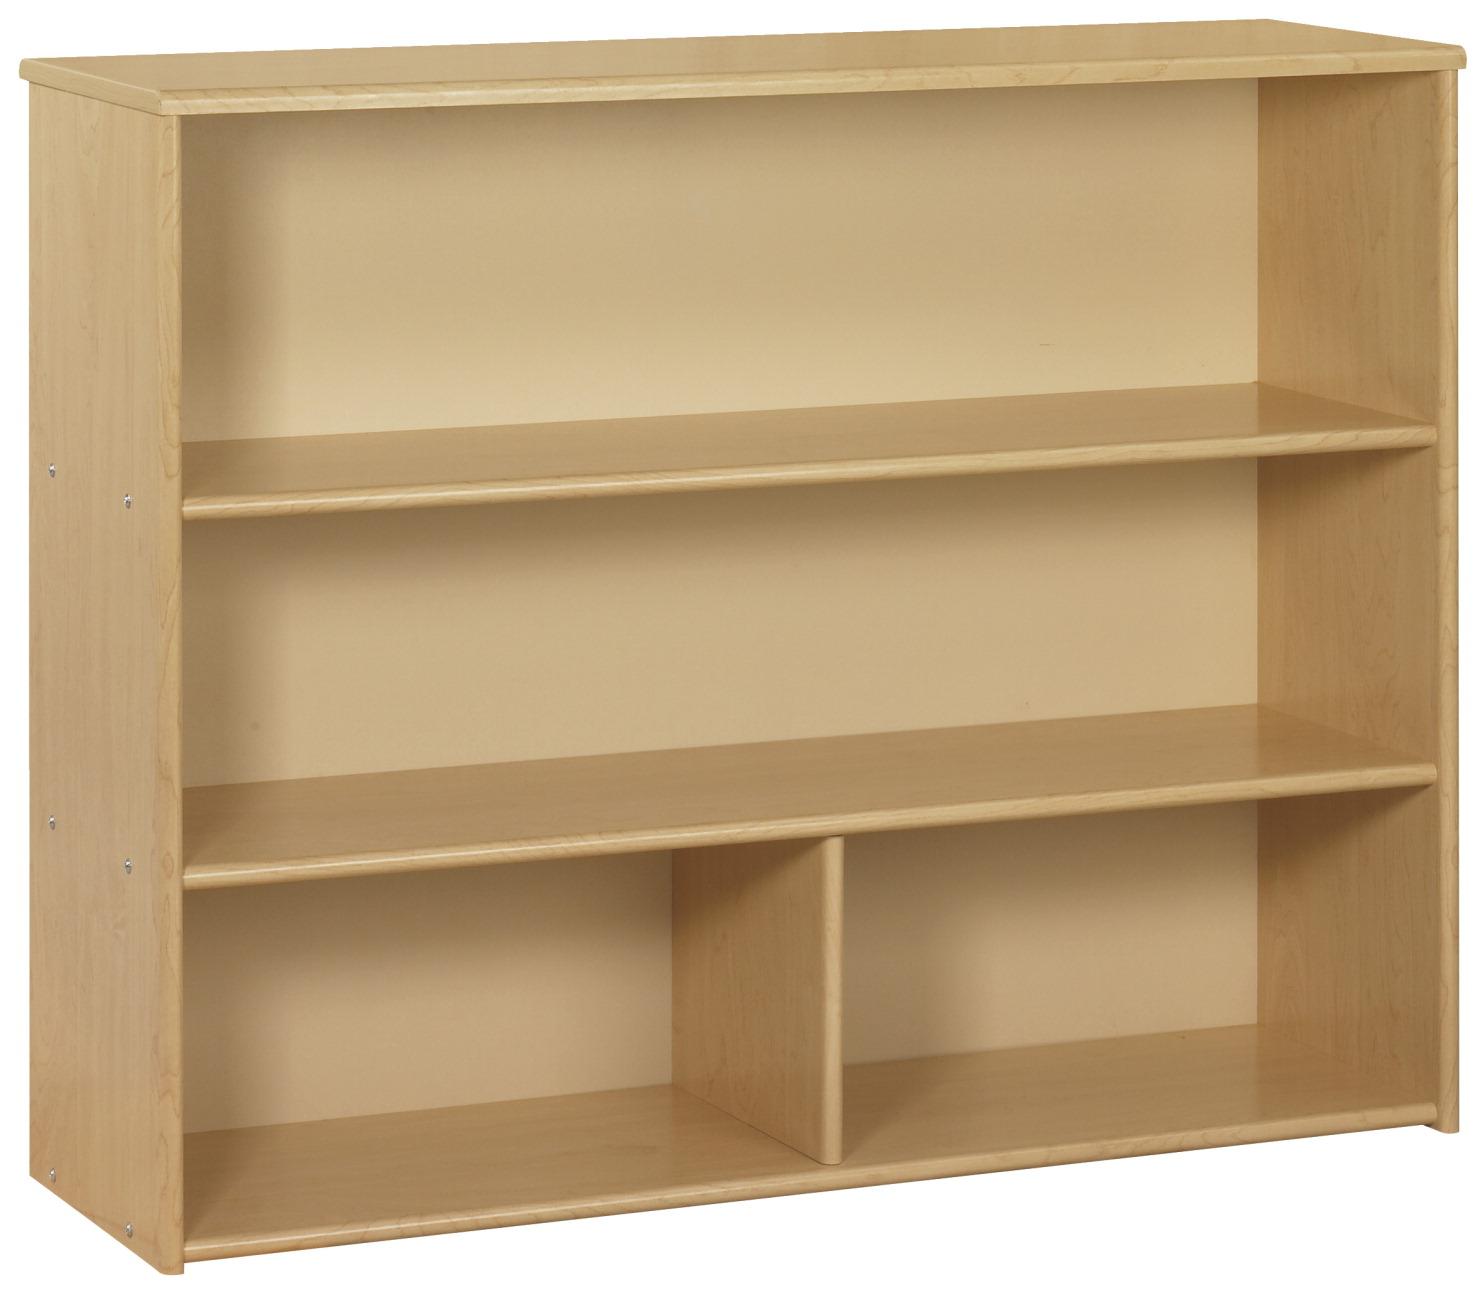 jumbo shelf storage